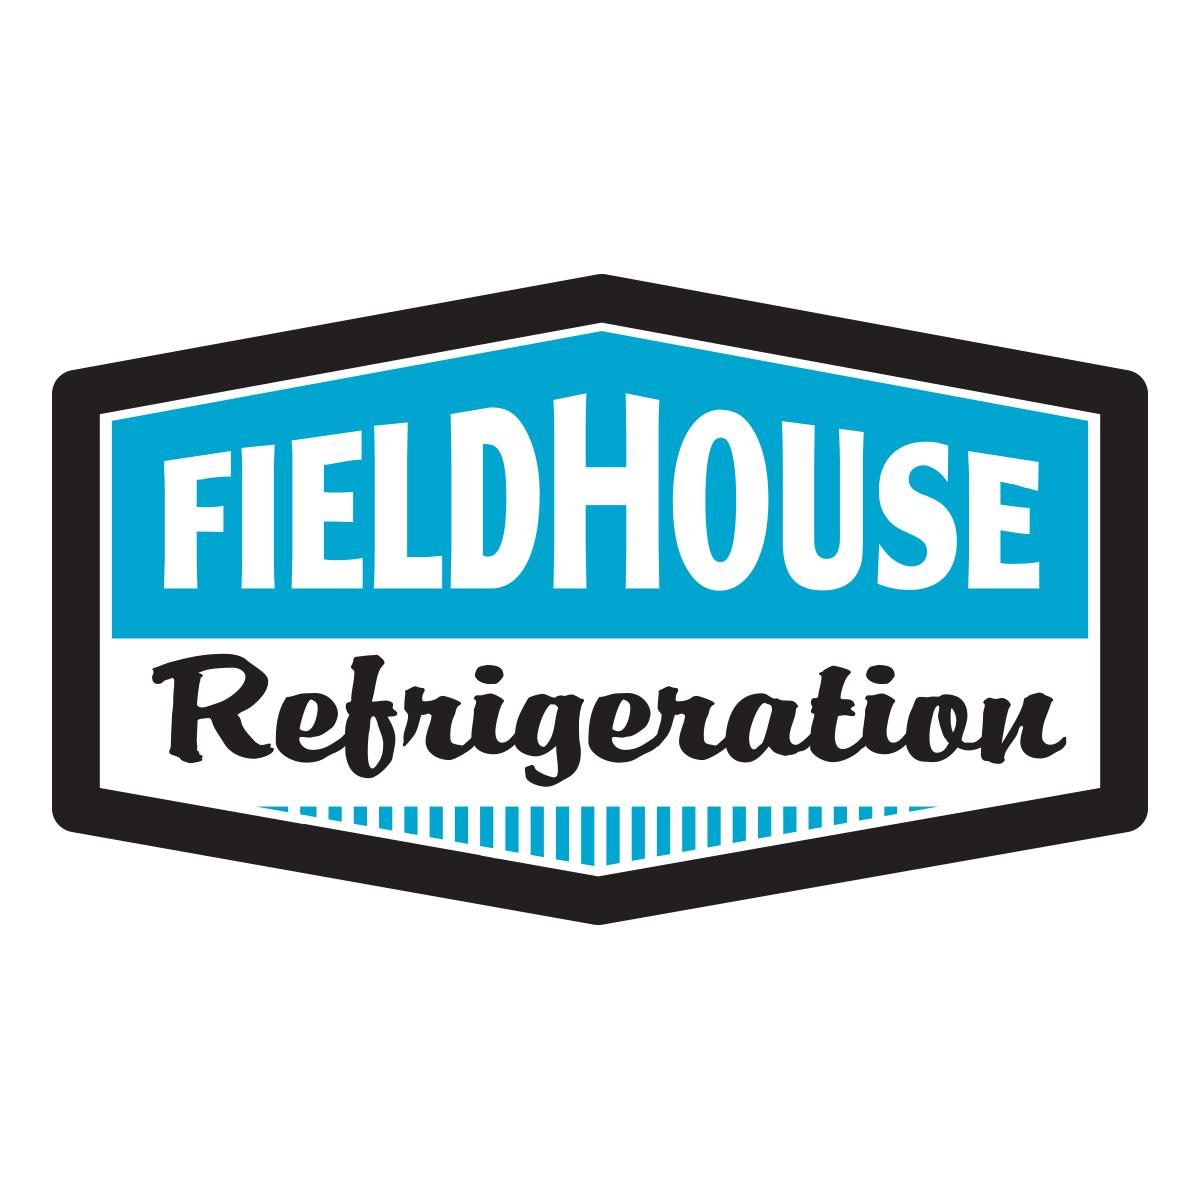 Fieldhouse Refrigeration